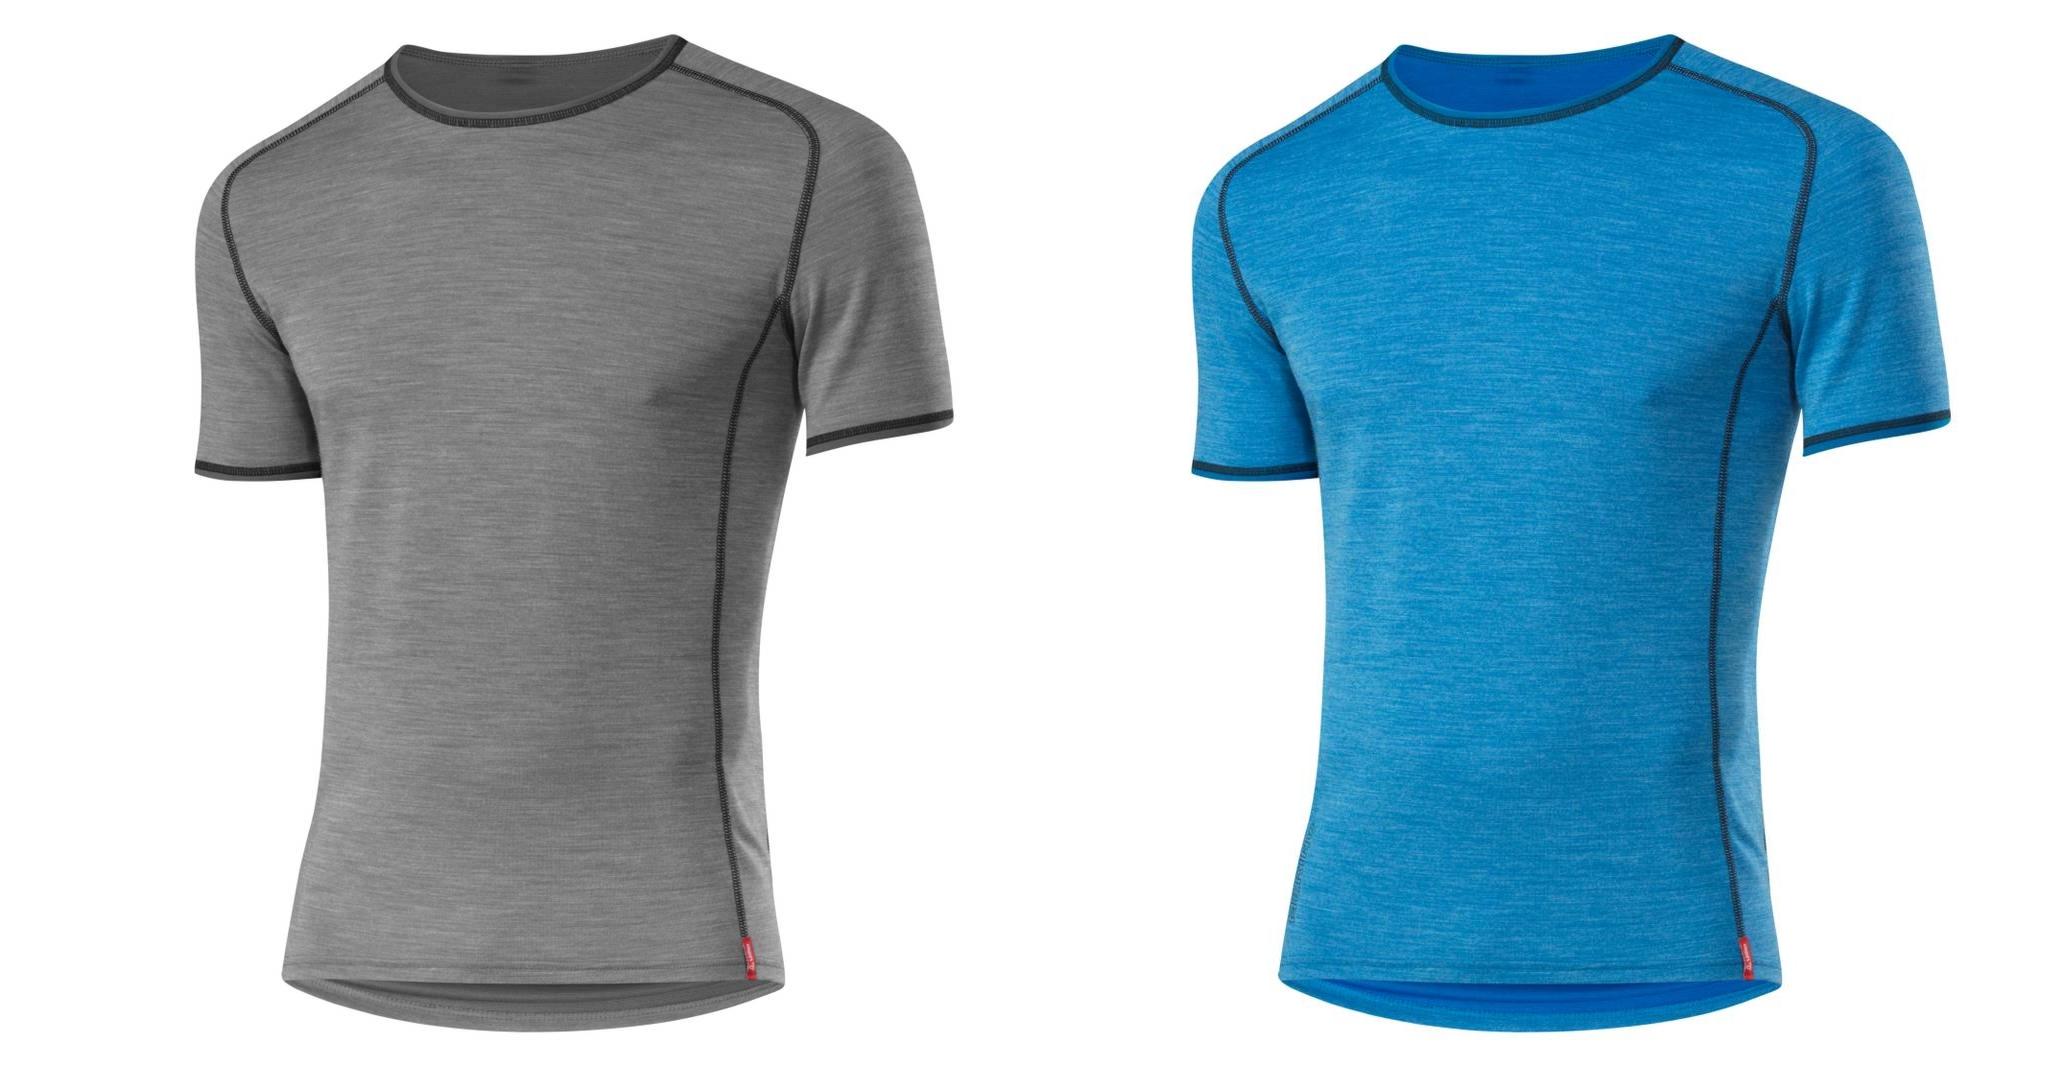 Löffler Shirt Transtex ® Merino ka 17658, funzione Camicia per Uomo